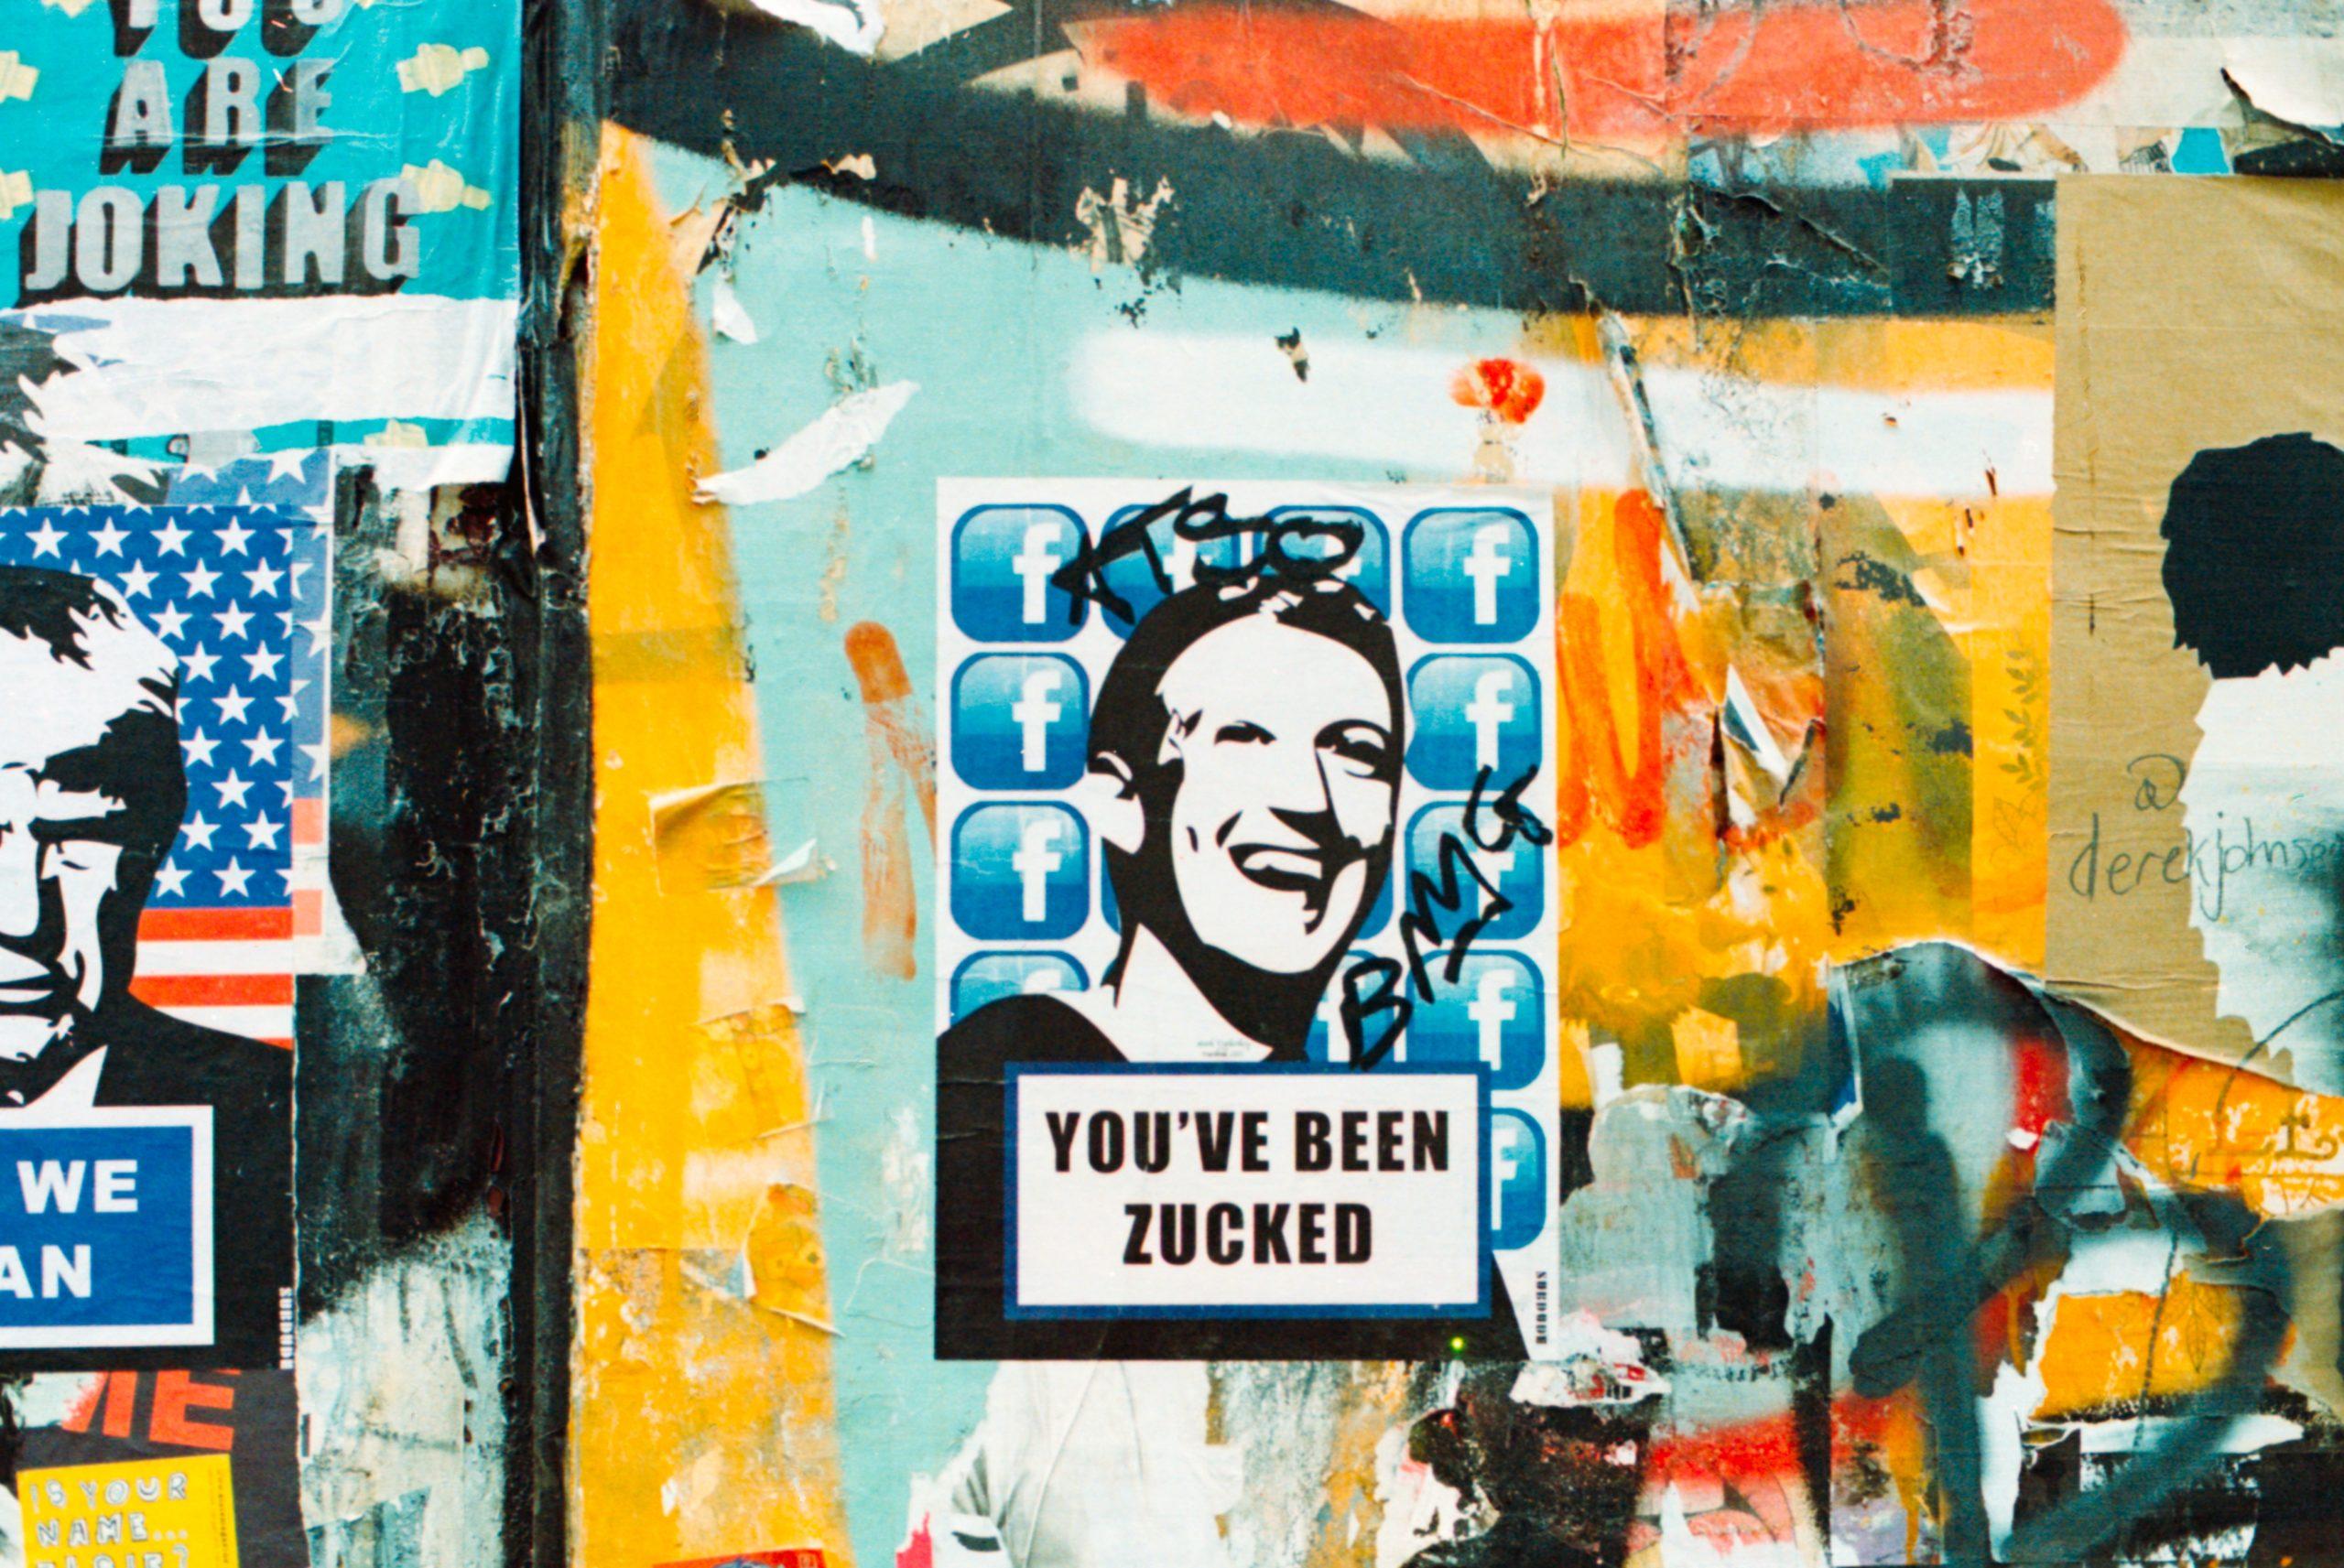 London Street art. Photo courtesy of Annie Spratt.